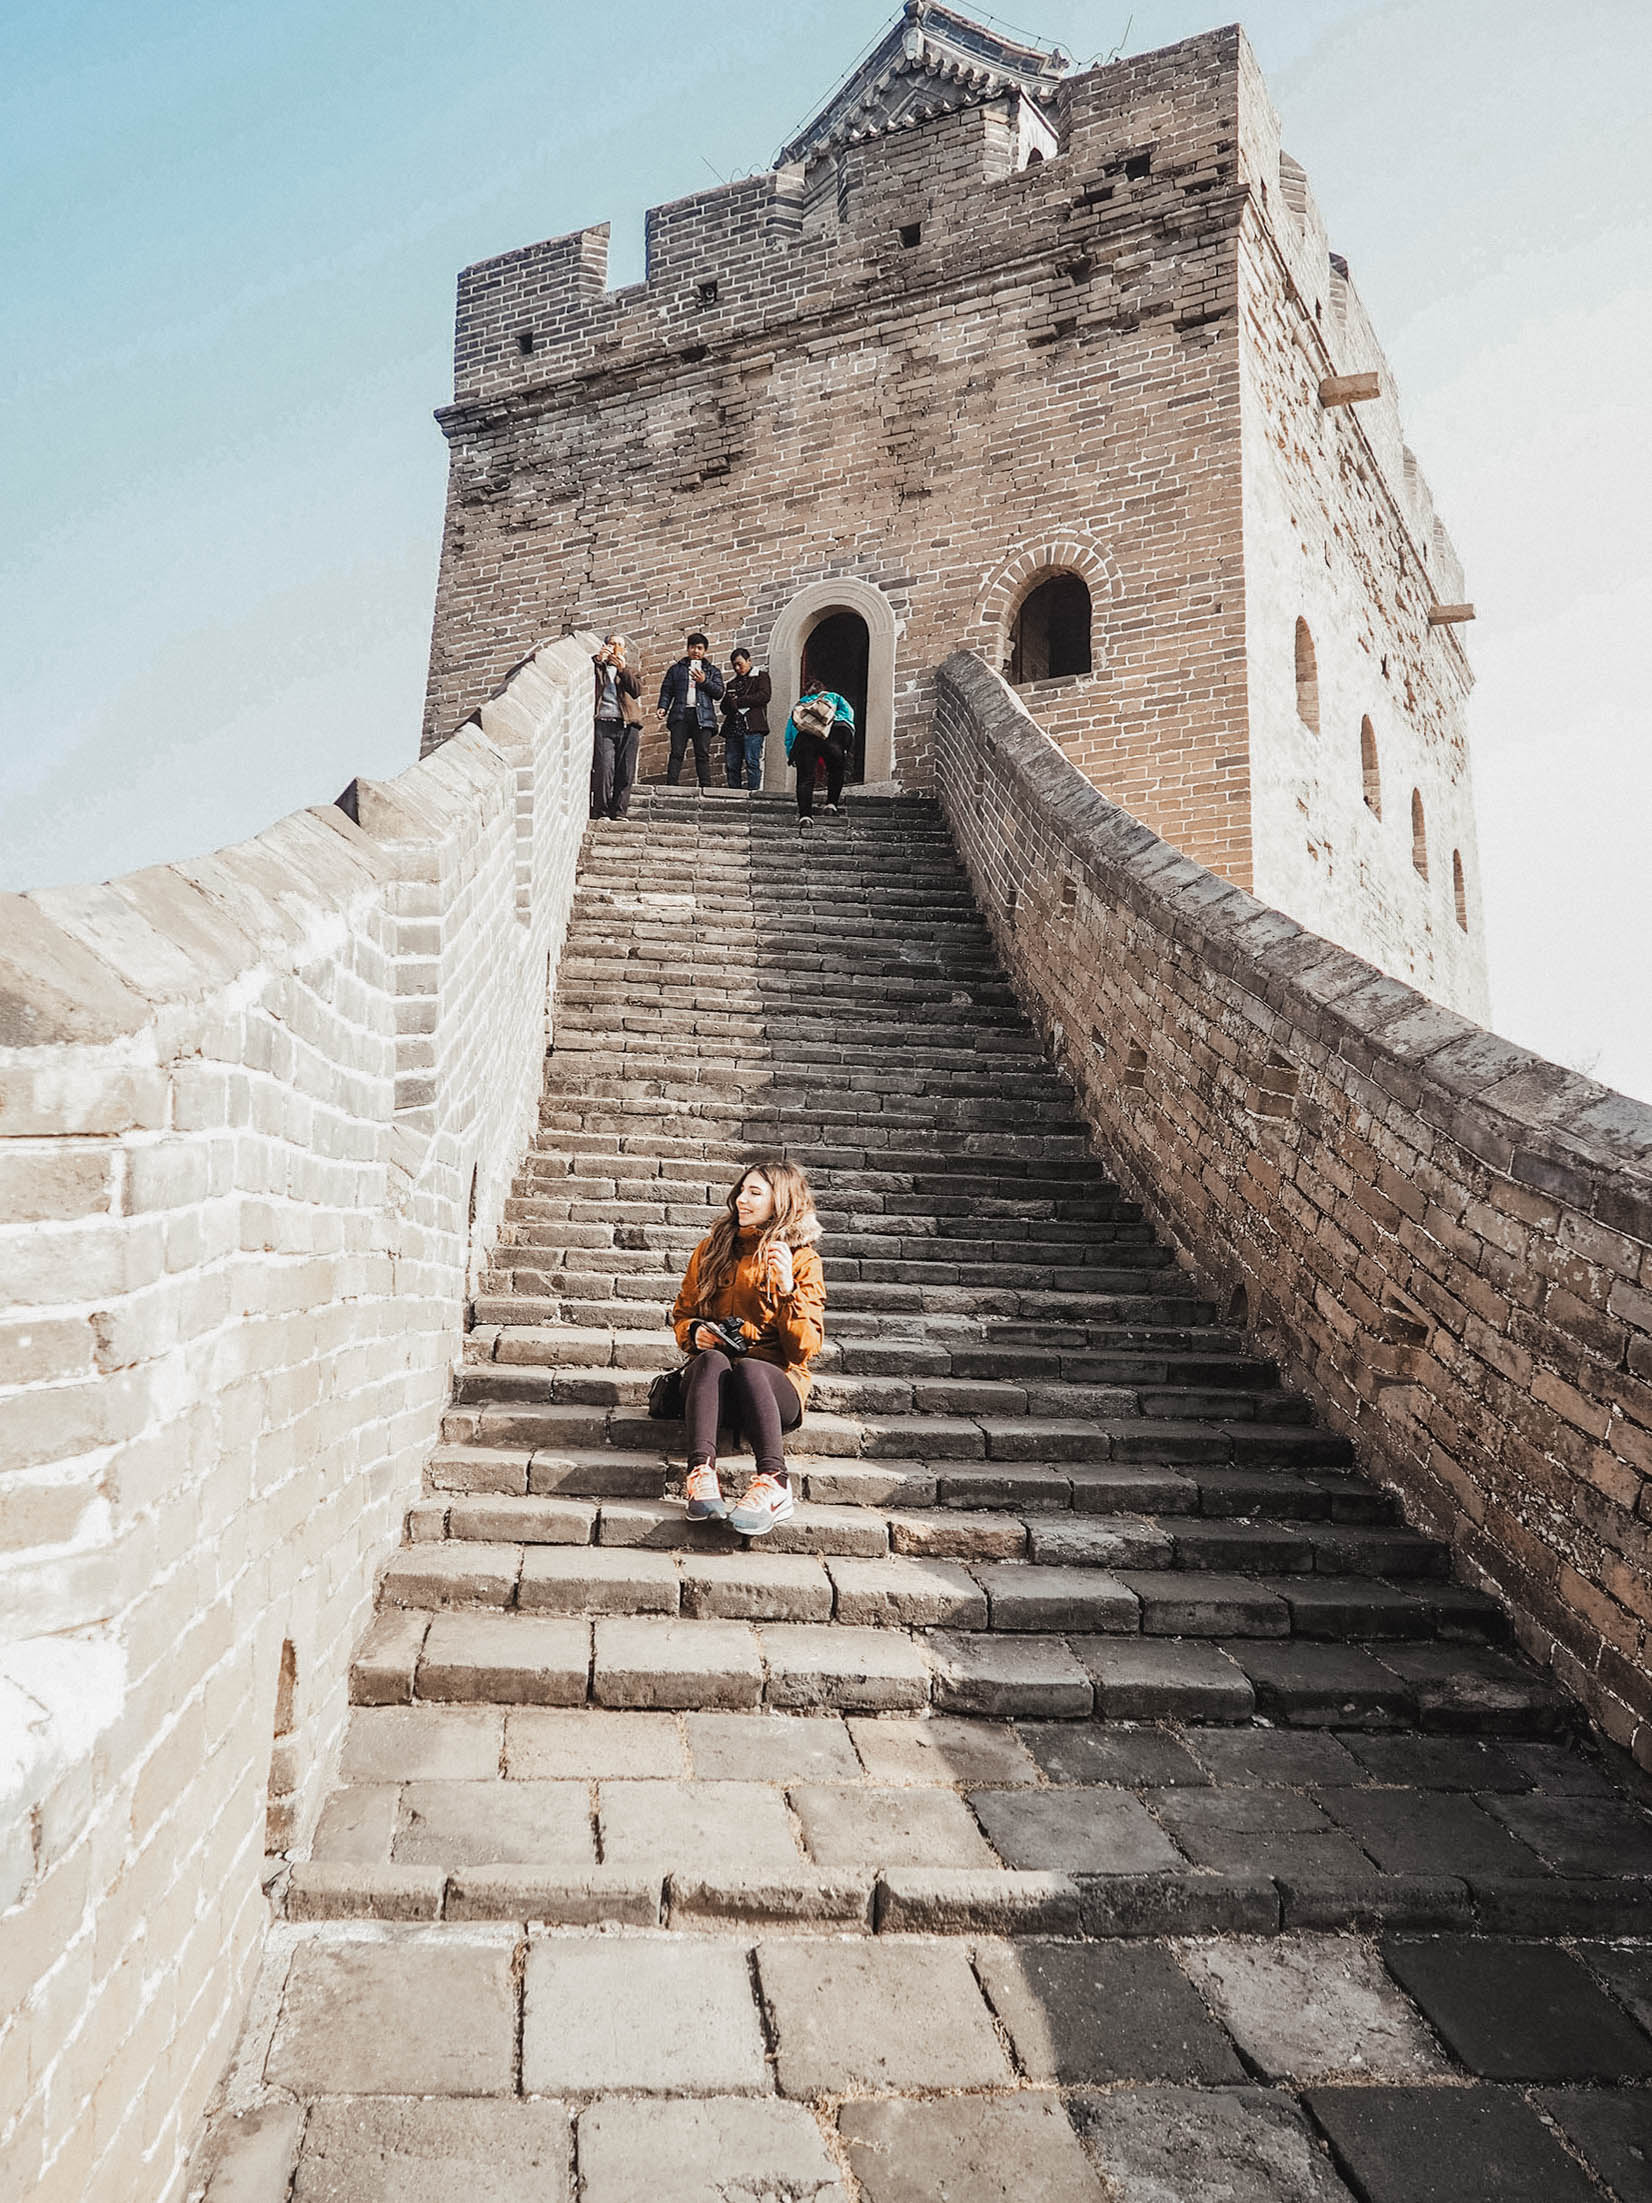 fernweh wolf Great Wall of china